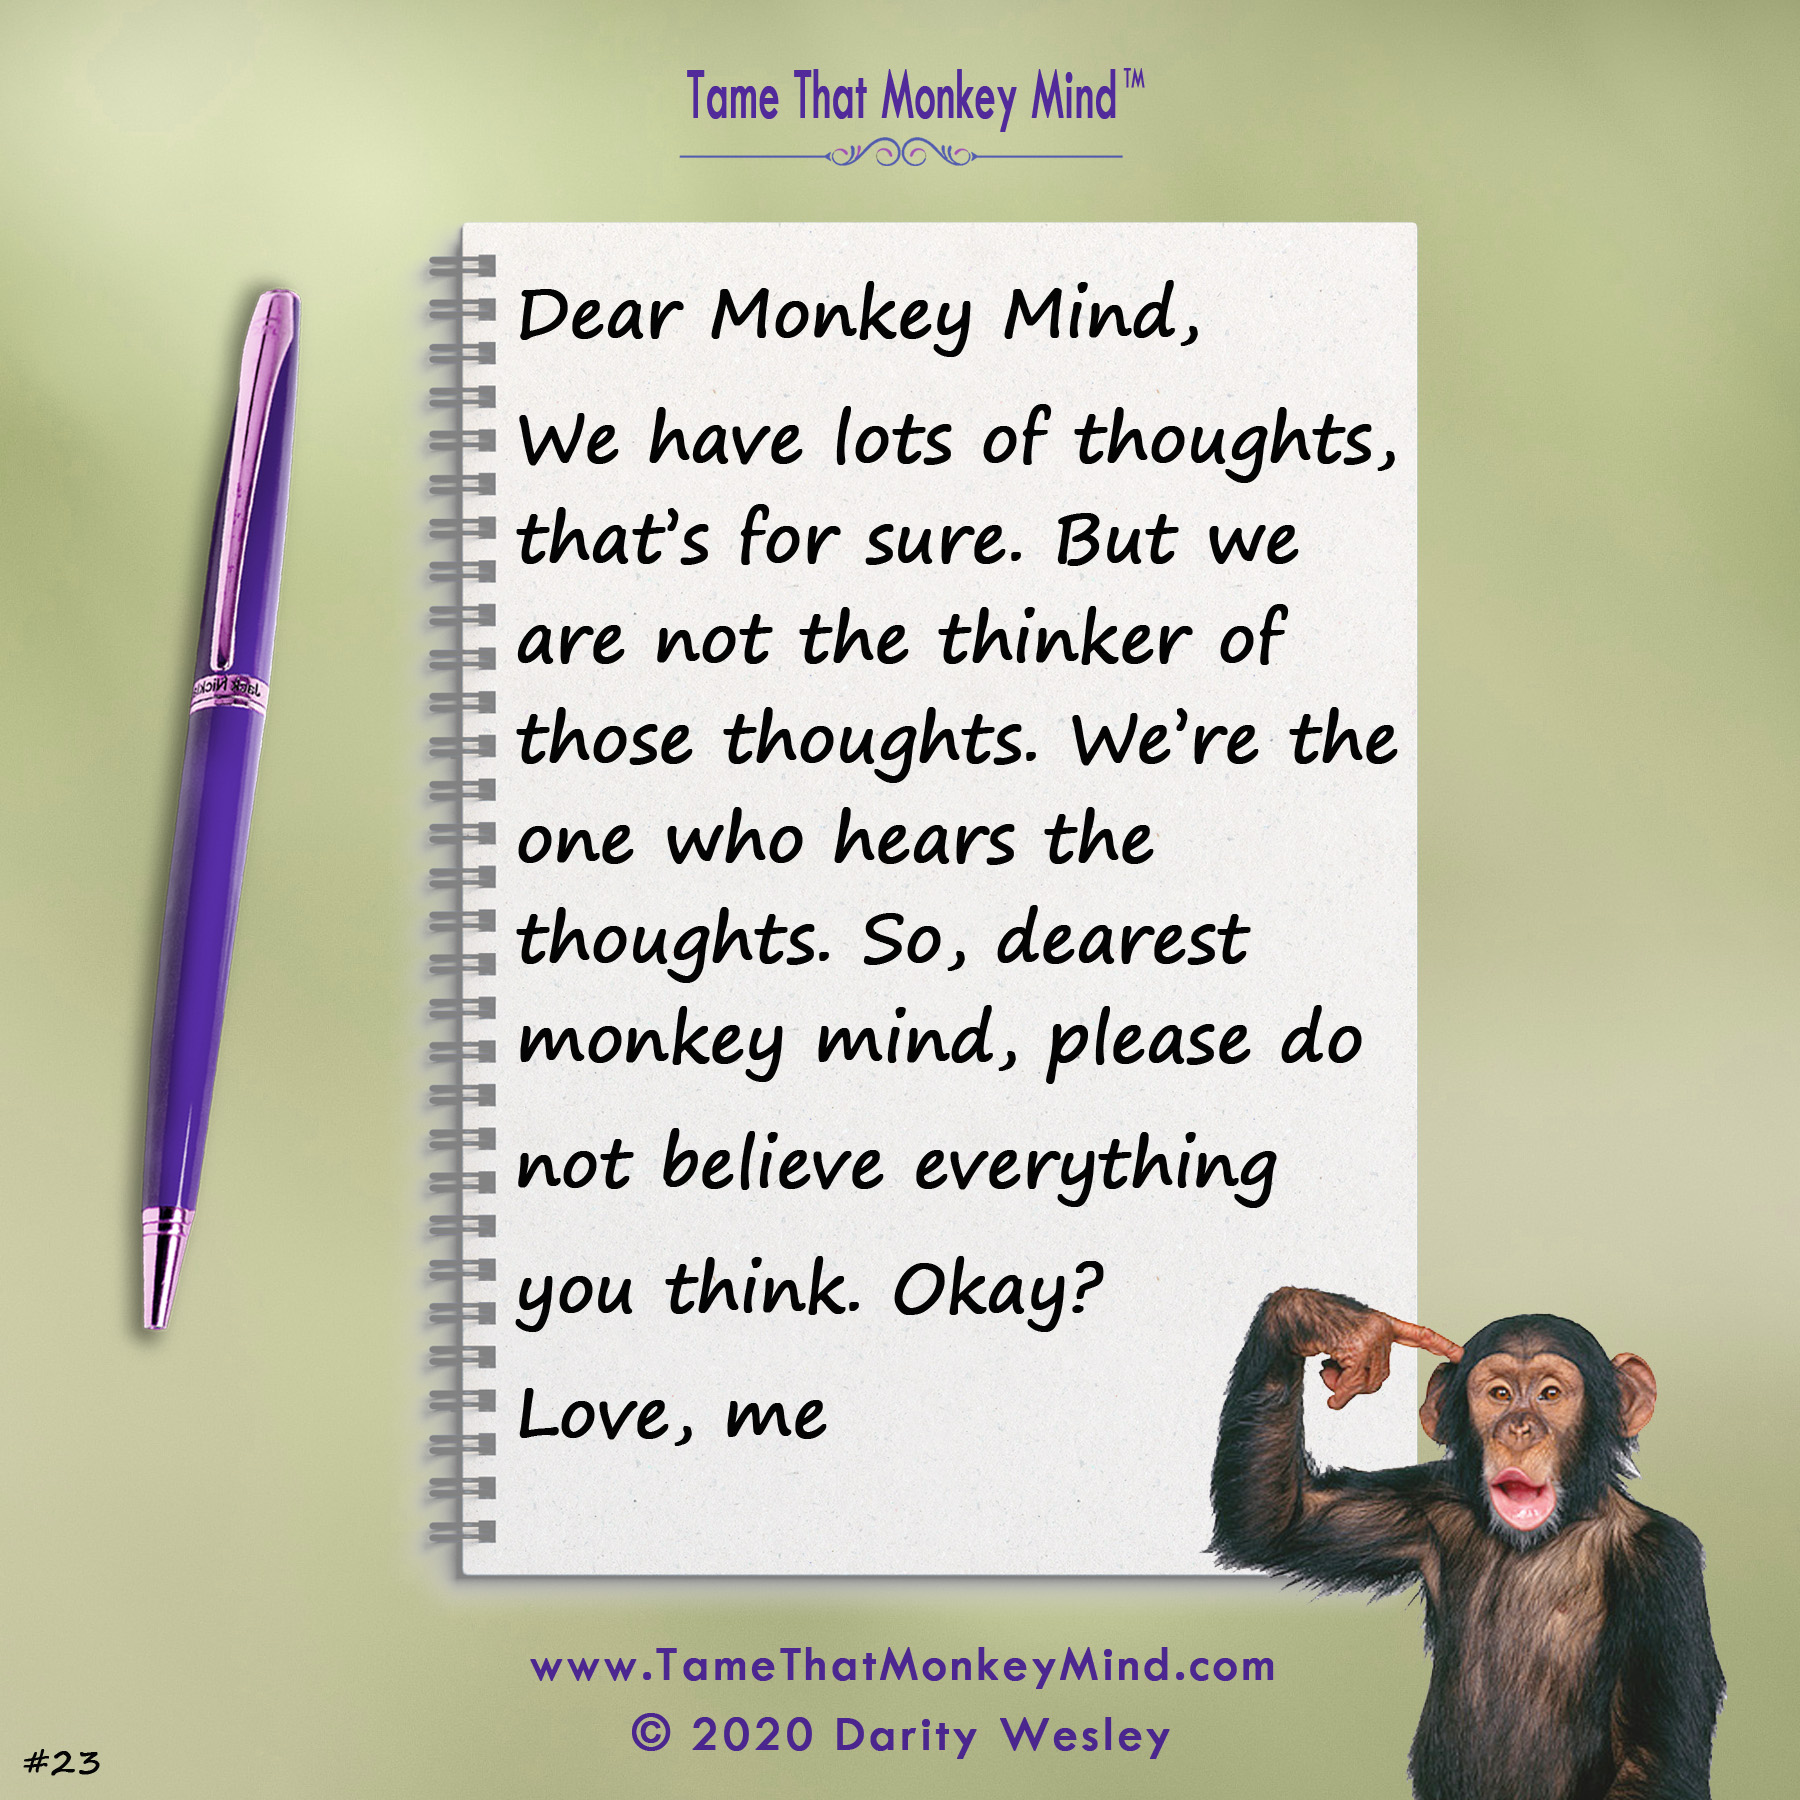 Dear Monkey Mind #23